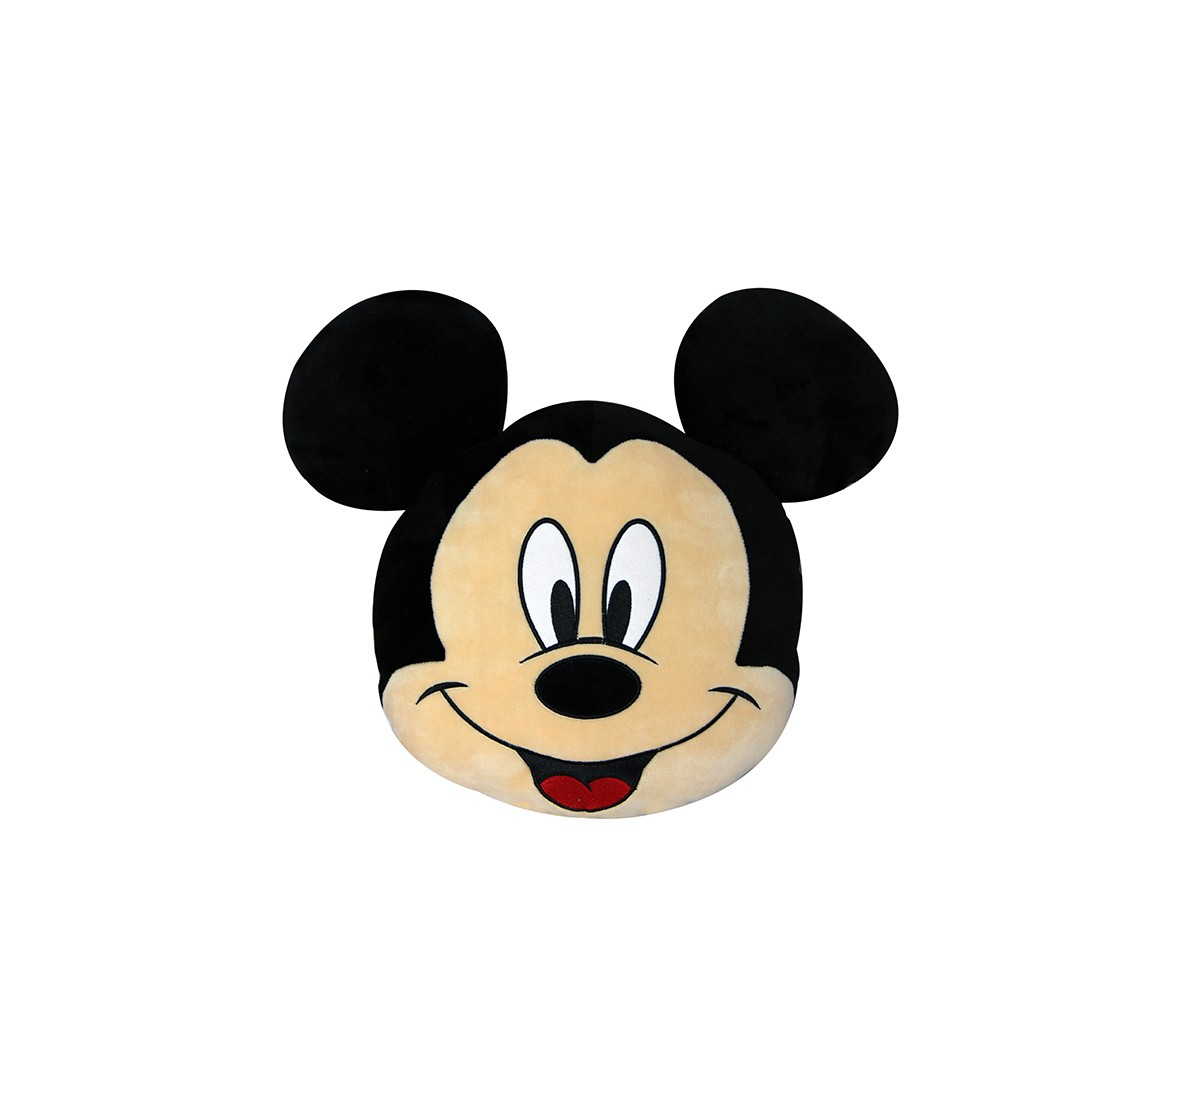 Disney 2Side Micky Minie Shape Cush Plush Accessories for Kids age 12M+ - 30.48 Cm